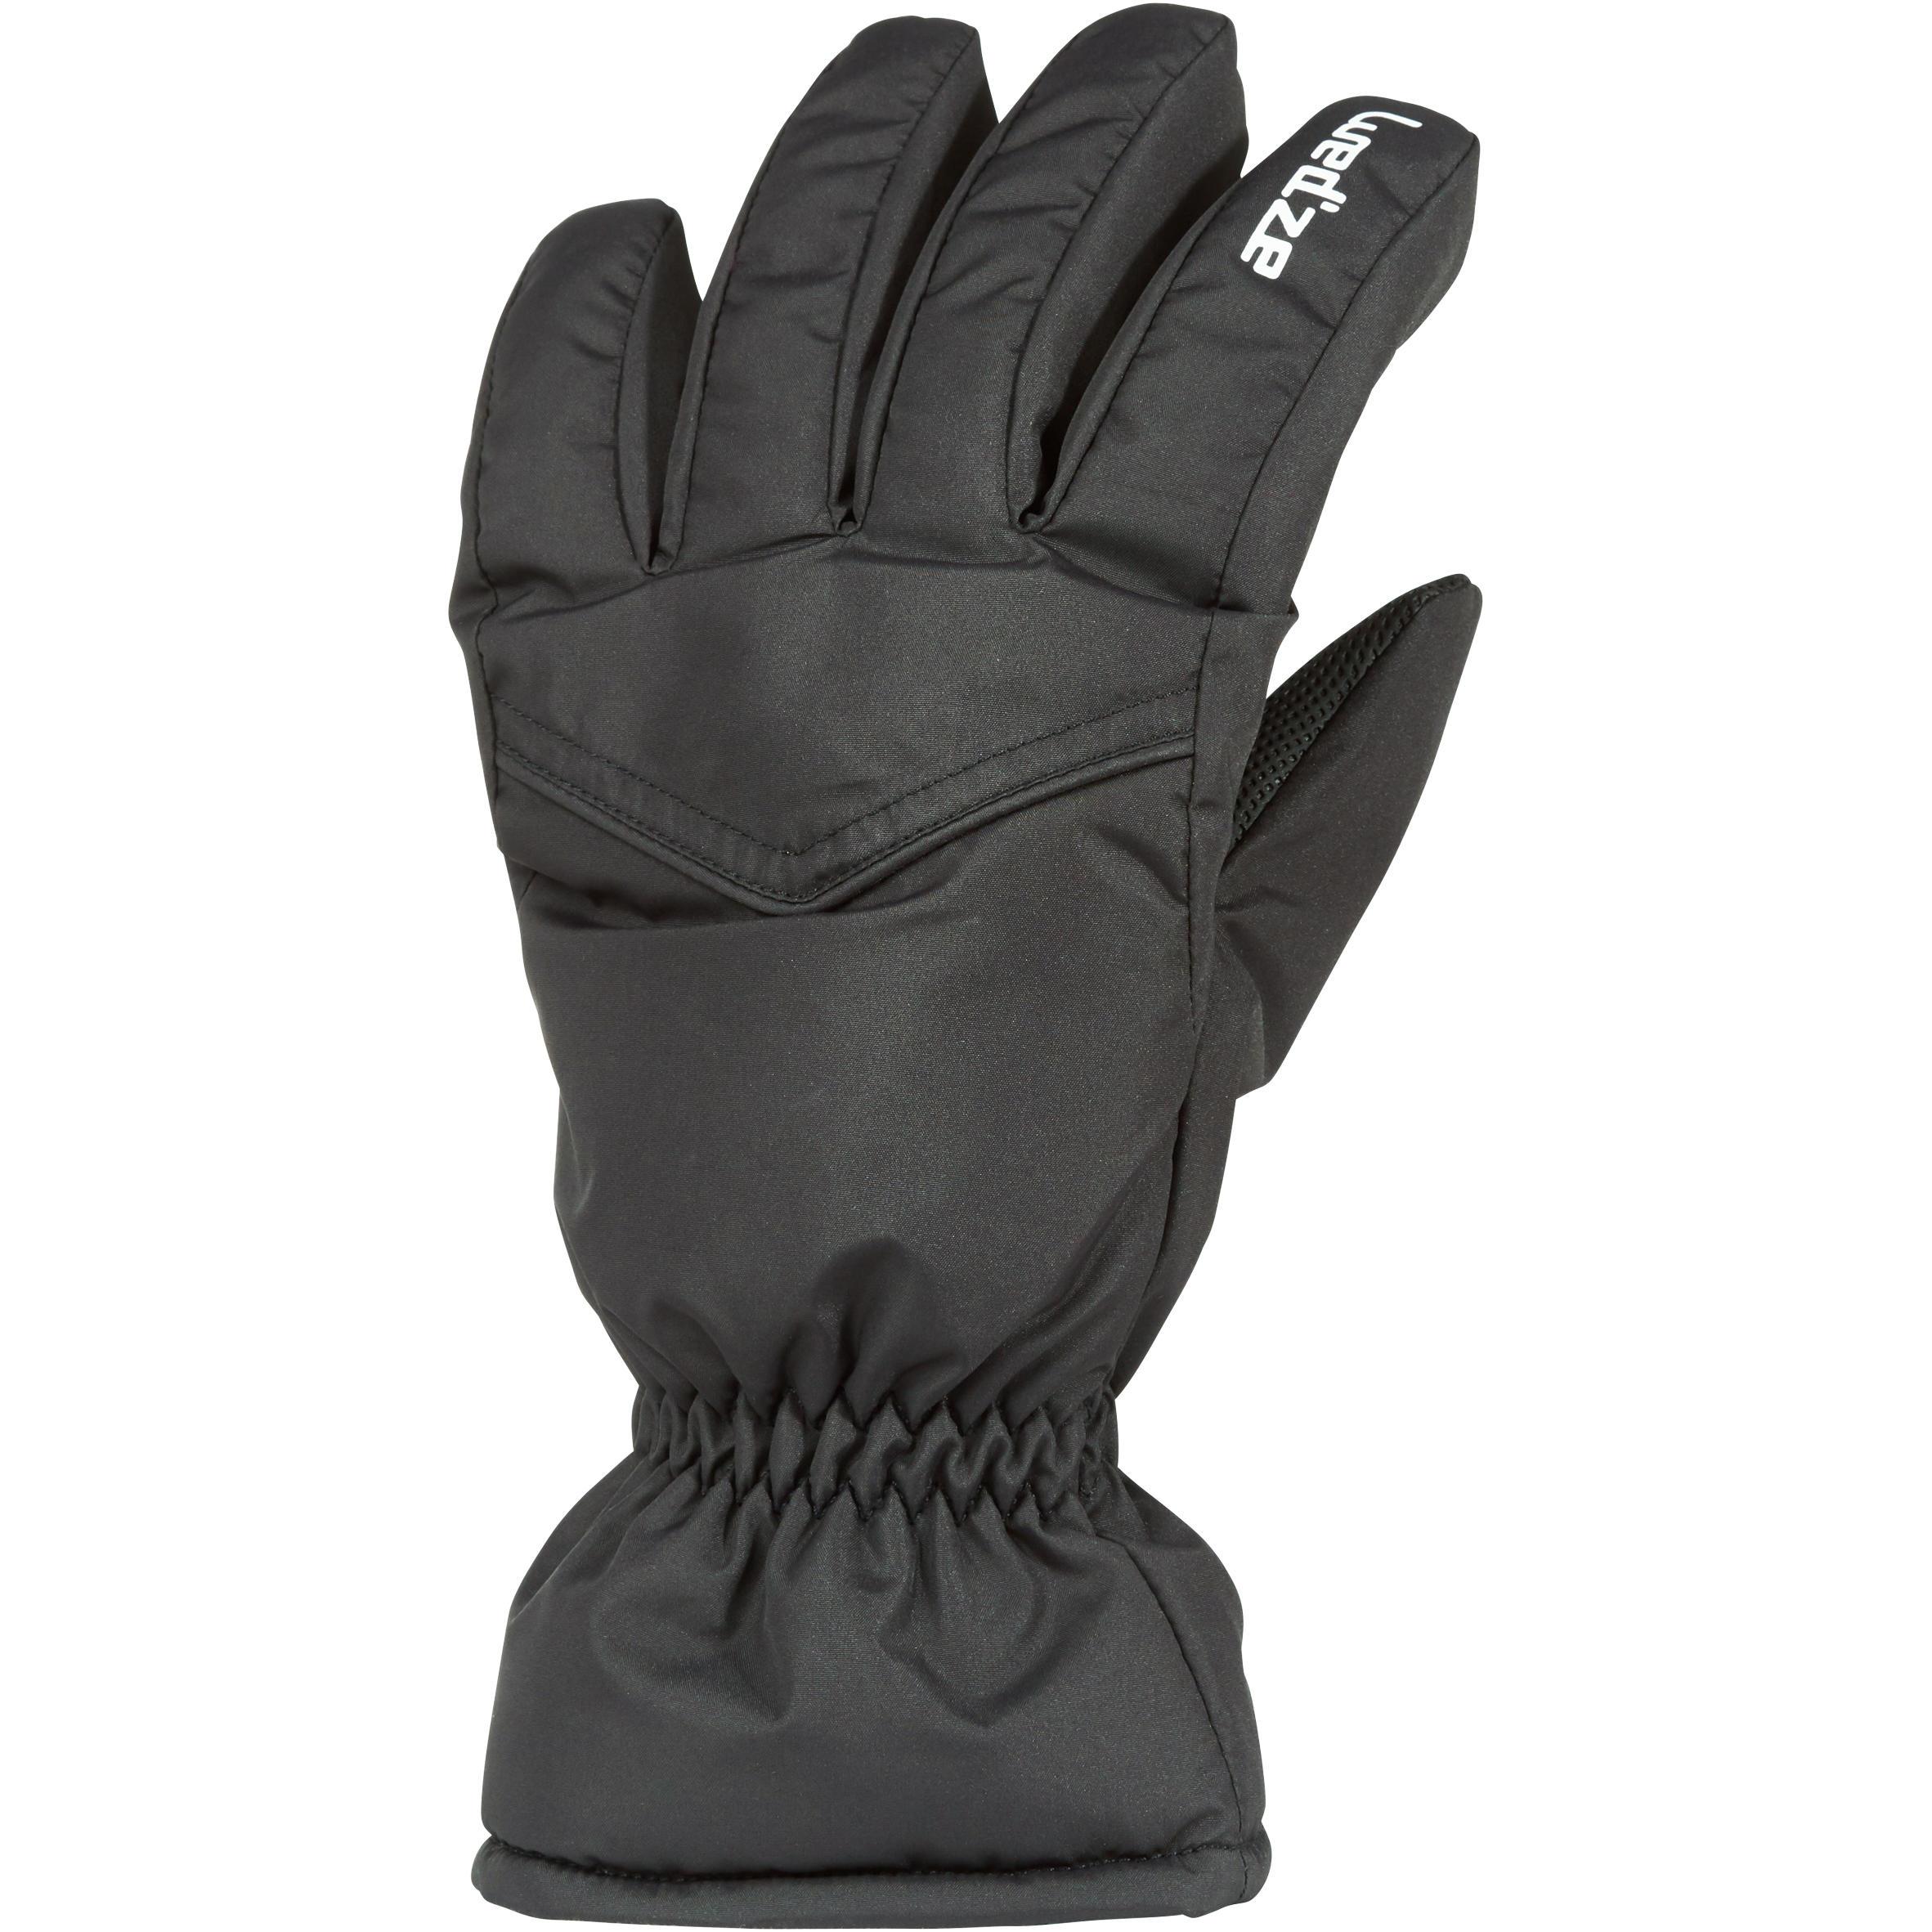 SKI-P GL 100 Adult Ski Gloves - Black